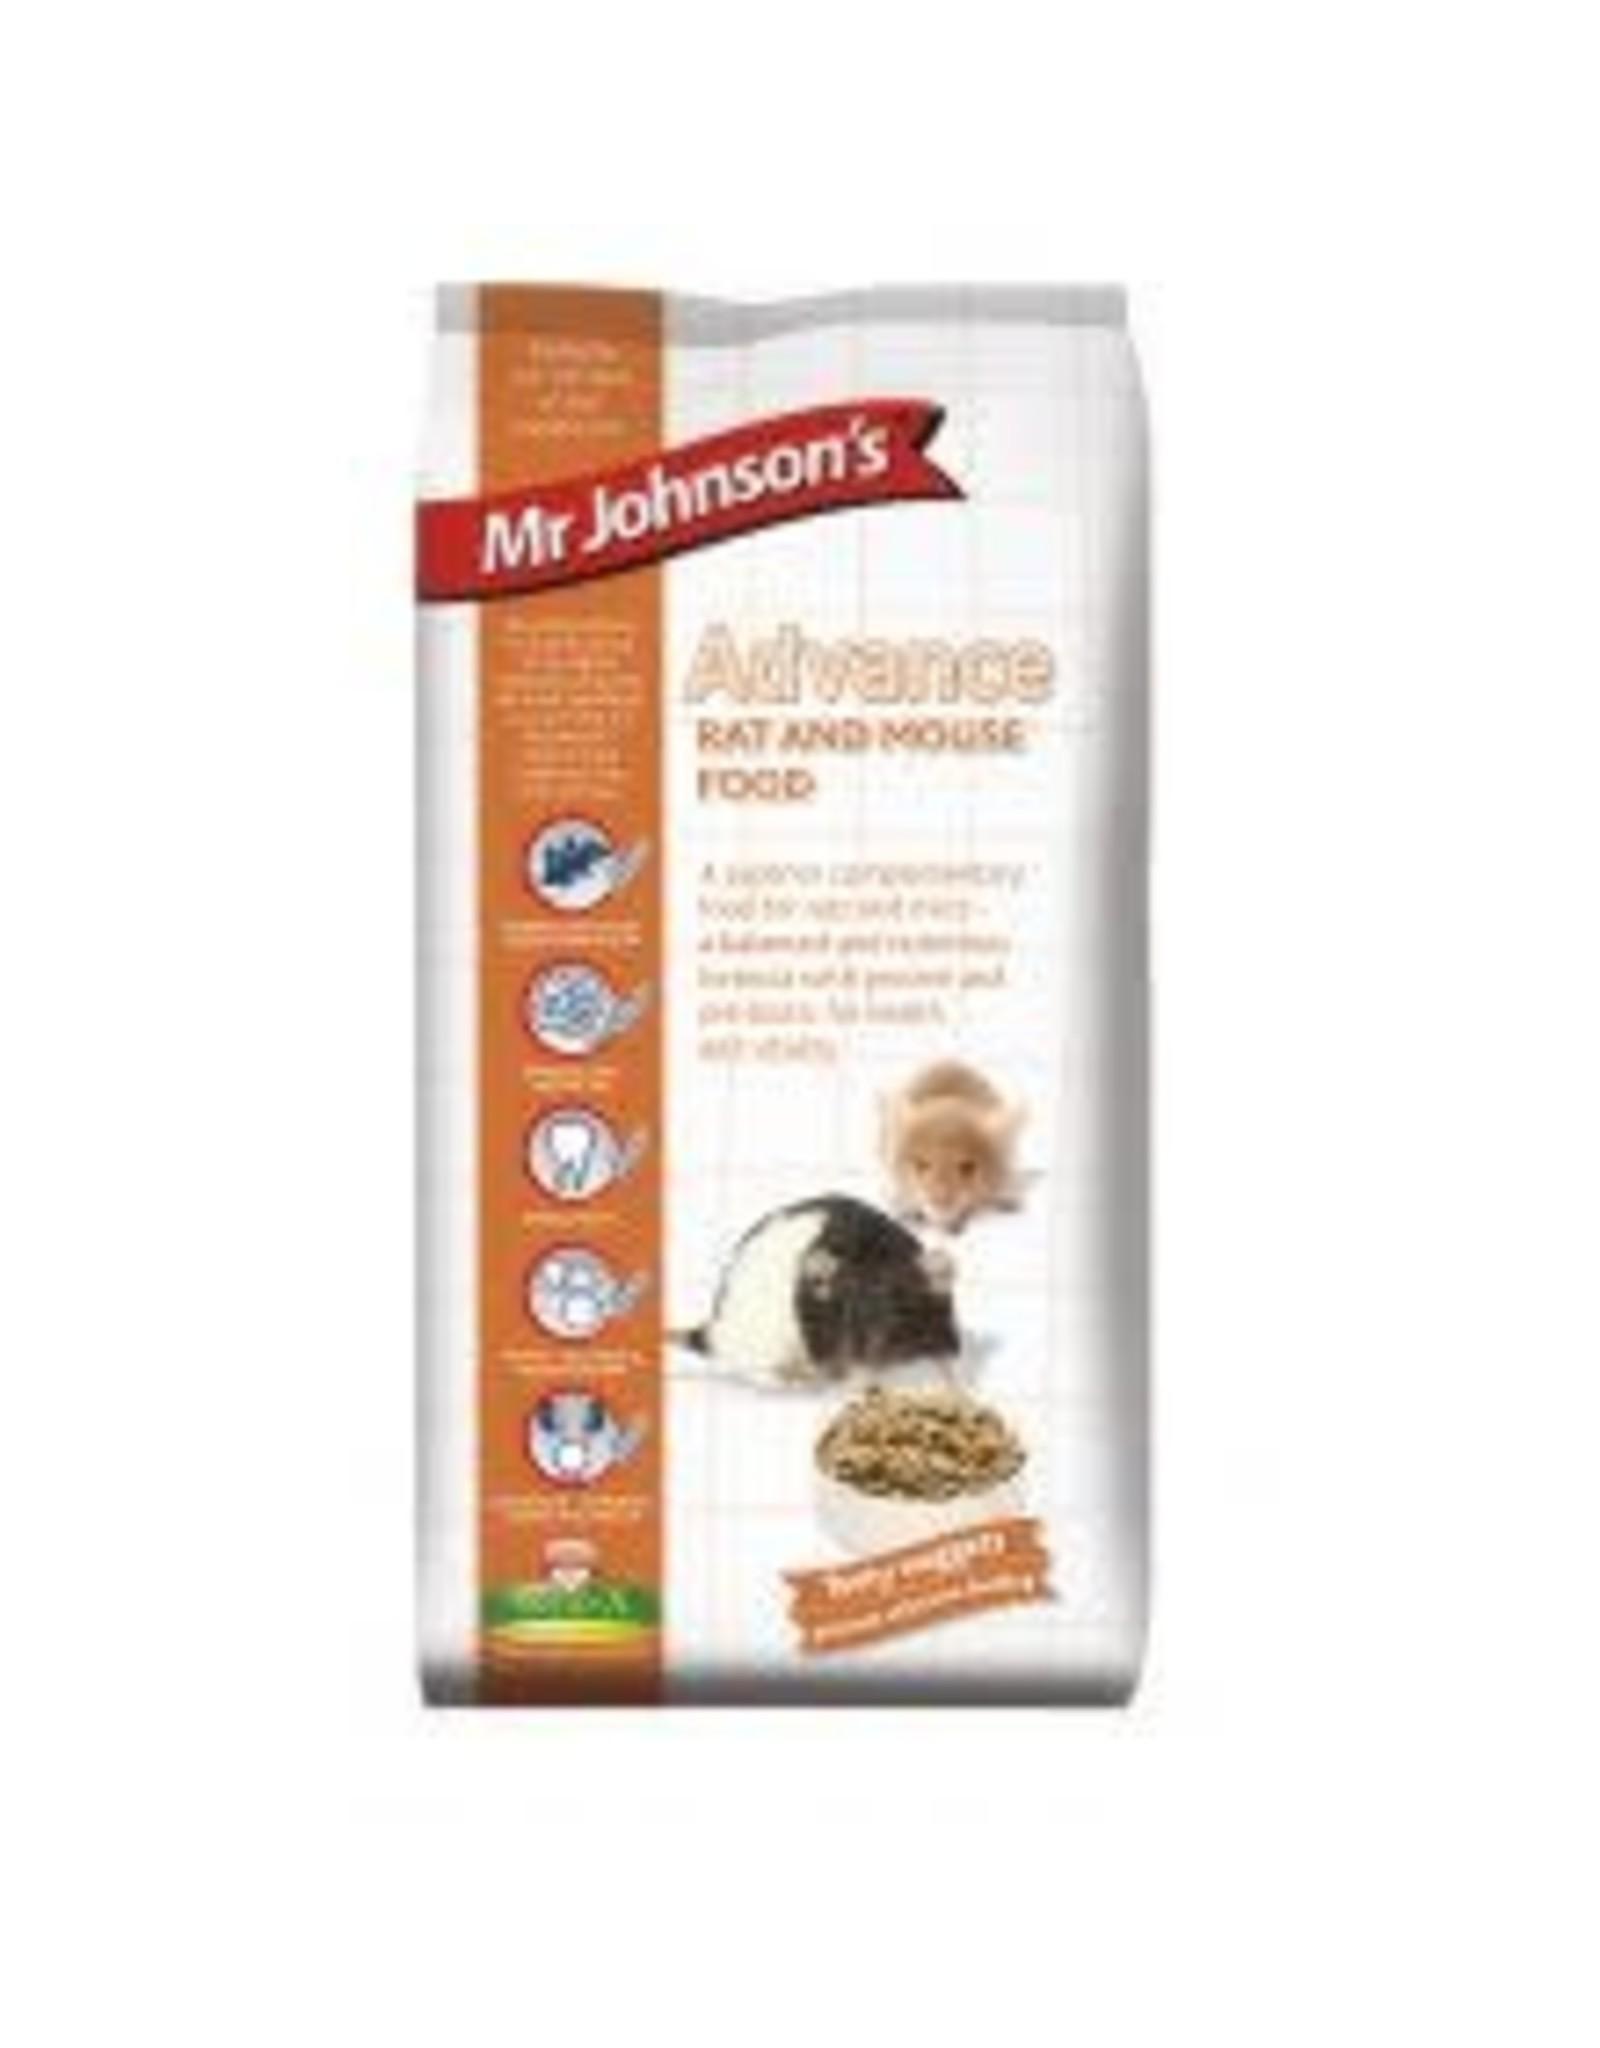 Mr Johnson's Mr Johnsons Advance Rat And Mouse Food 750g